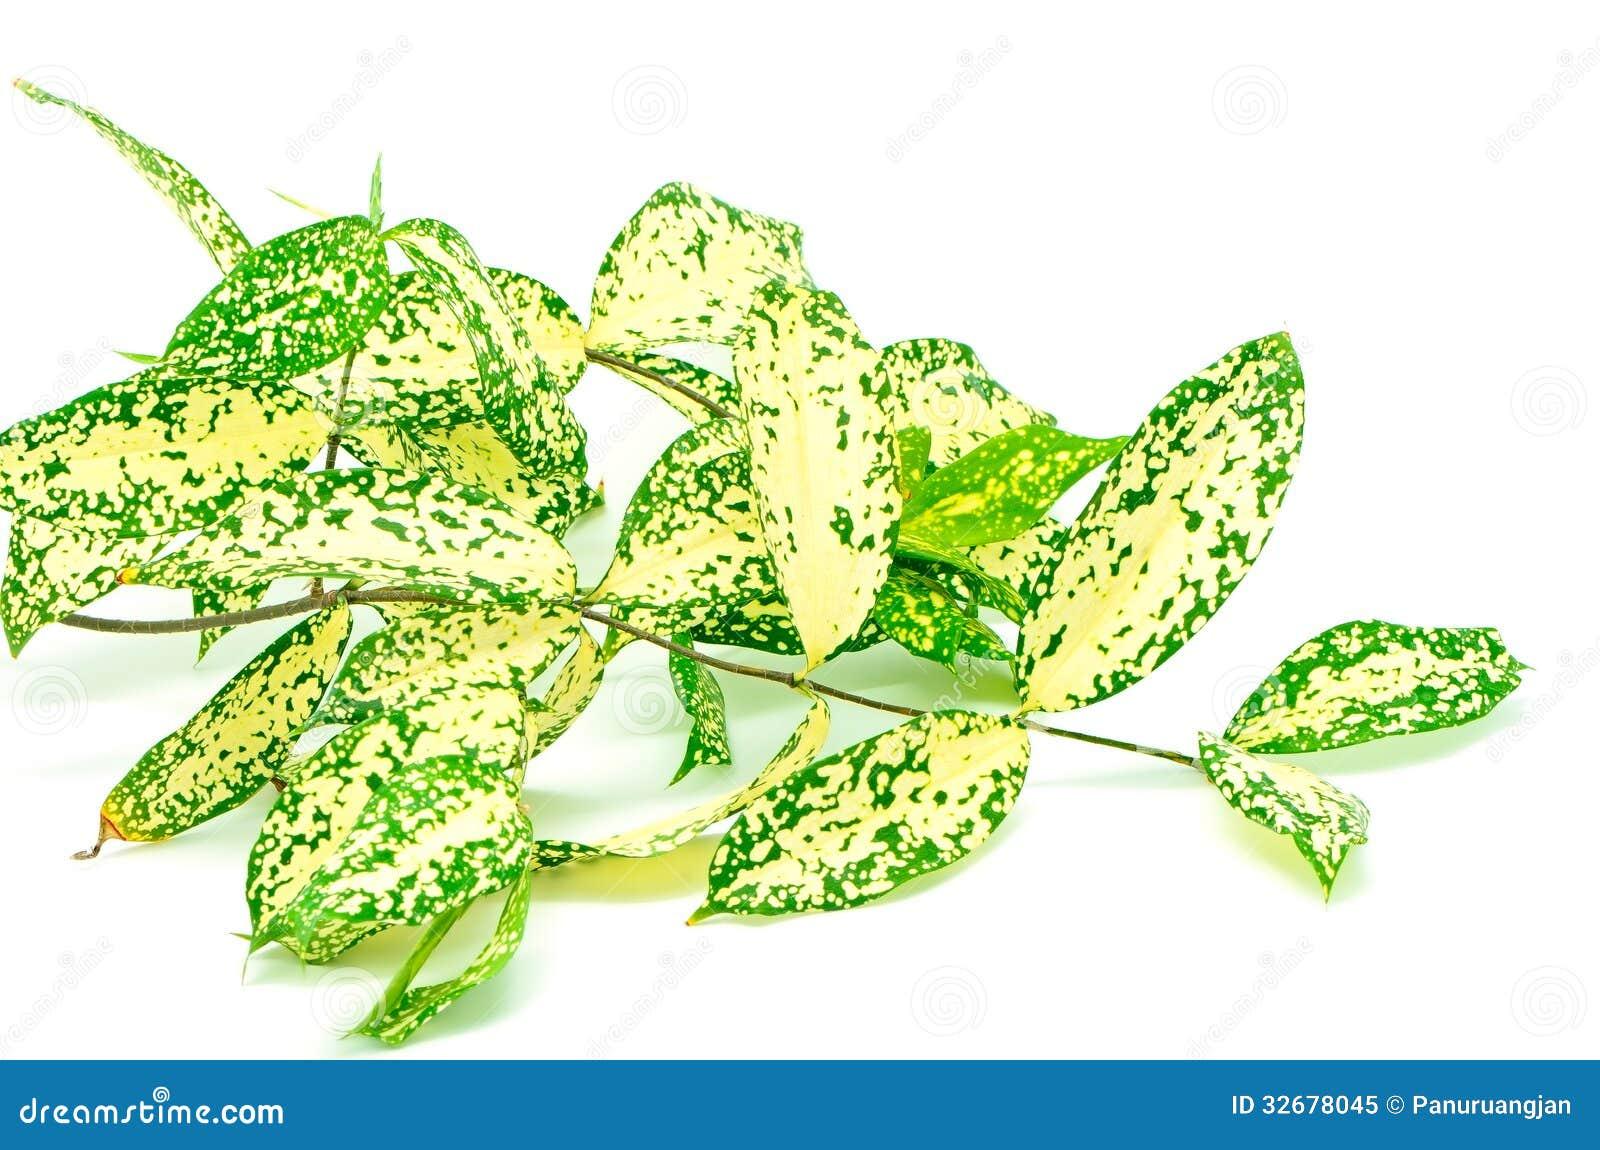 Foliage leaves of dracaena Gold Dust dracaena or Spotted dracaena  #0F4B04